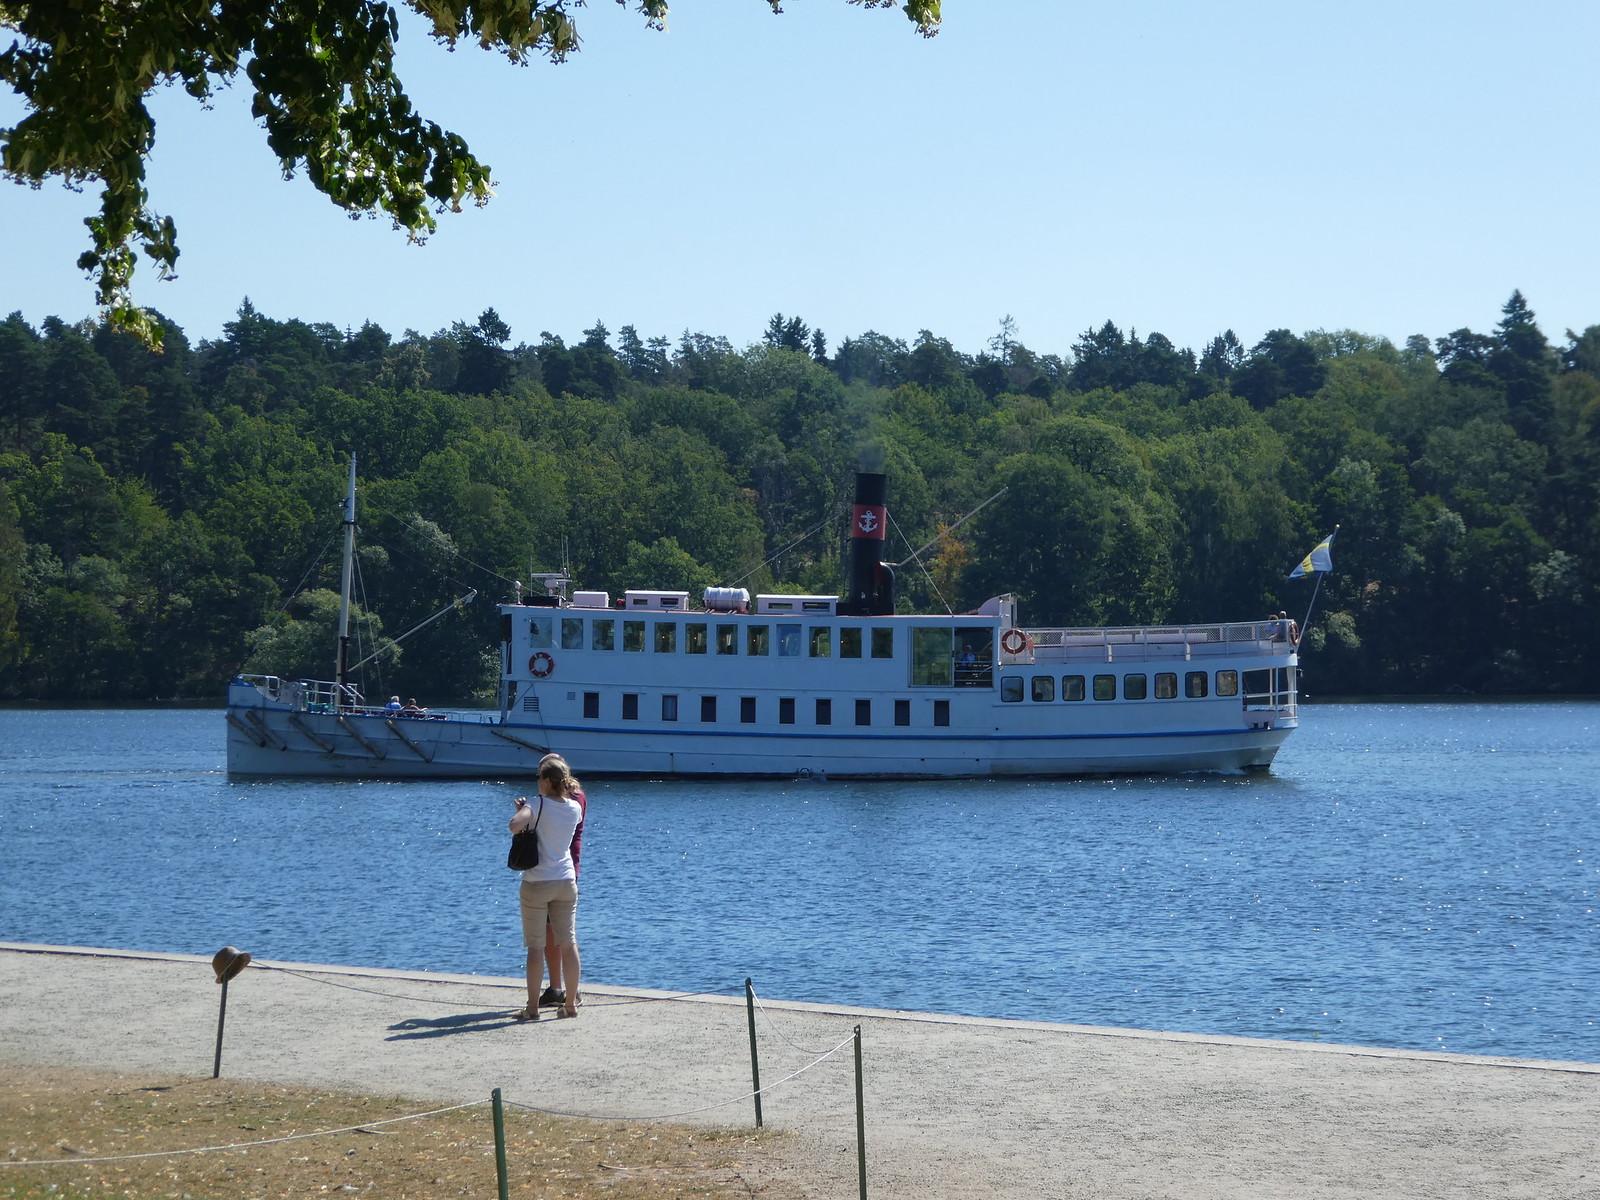 Drottningholm Palace ferry boat, Stockholm